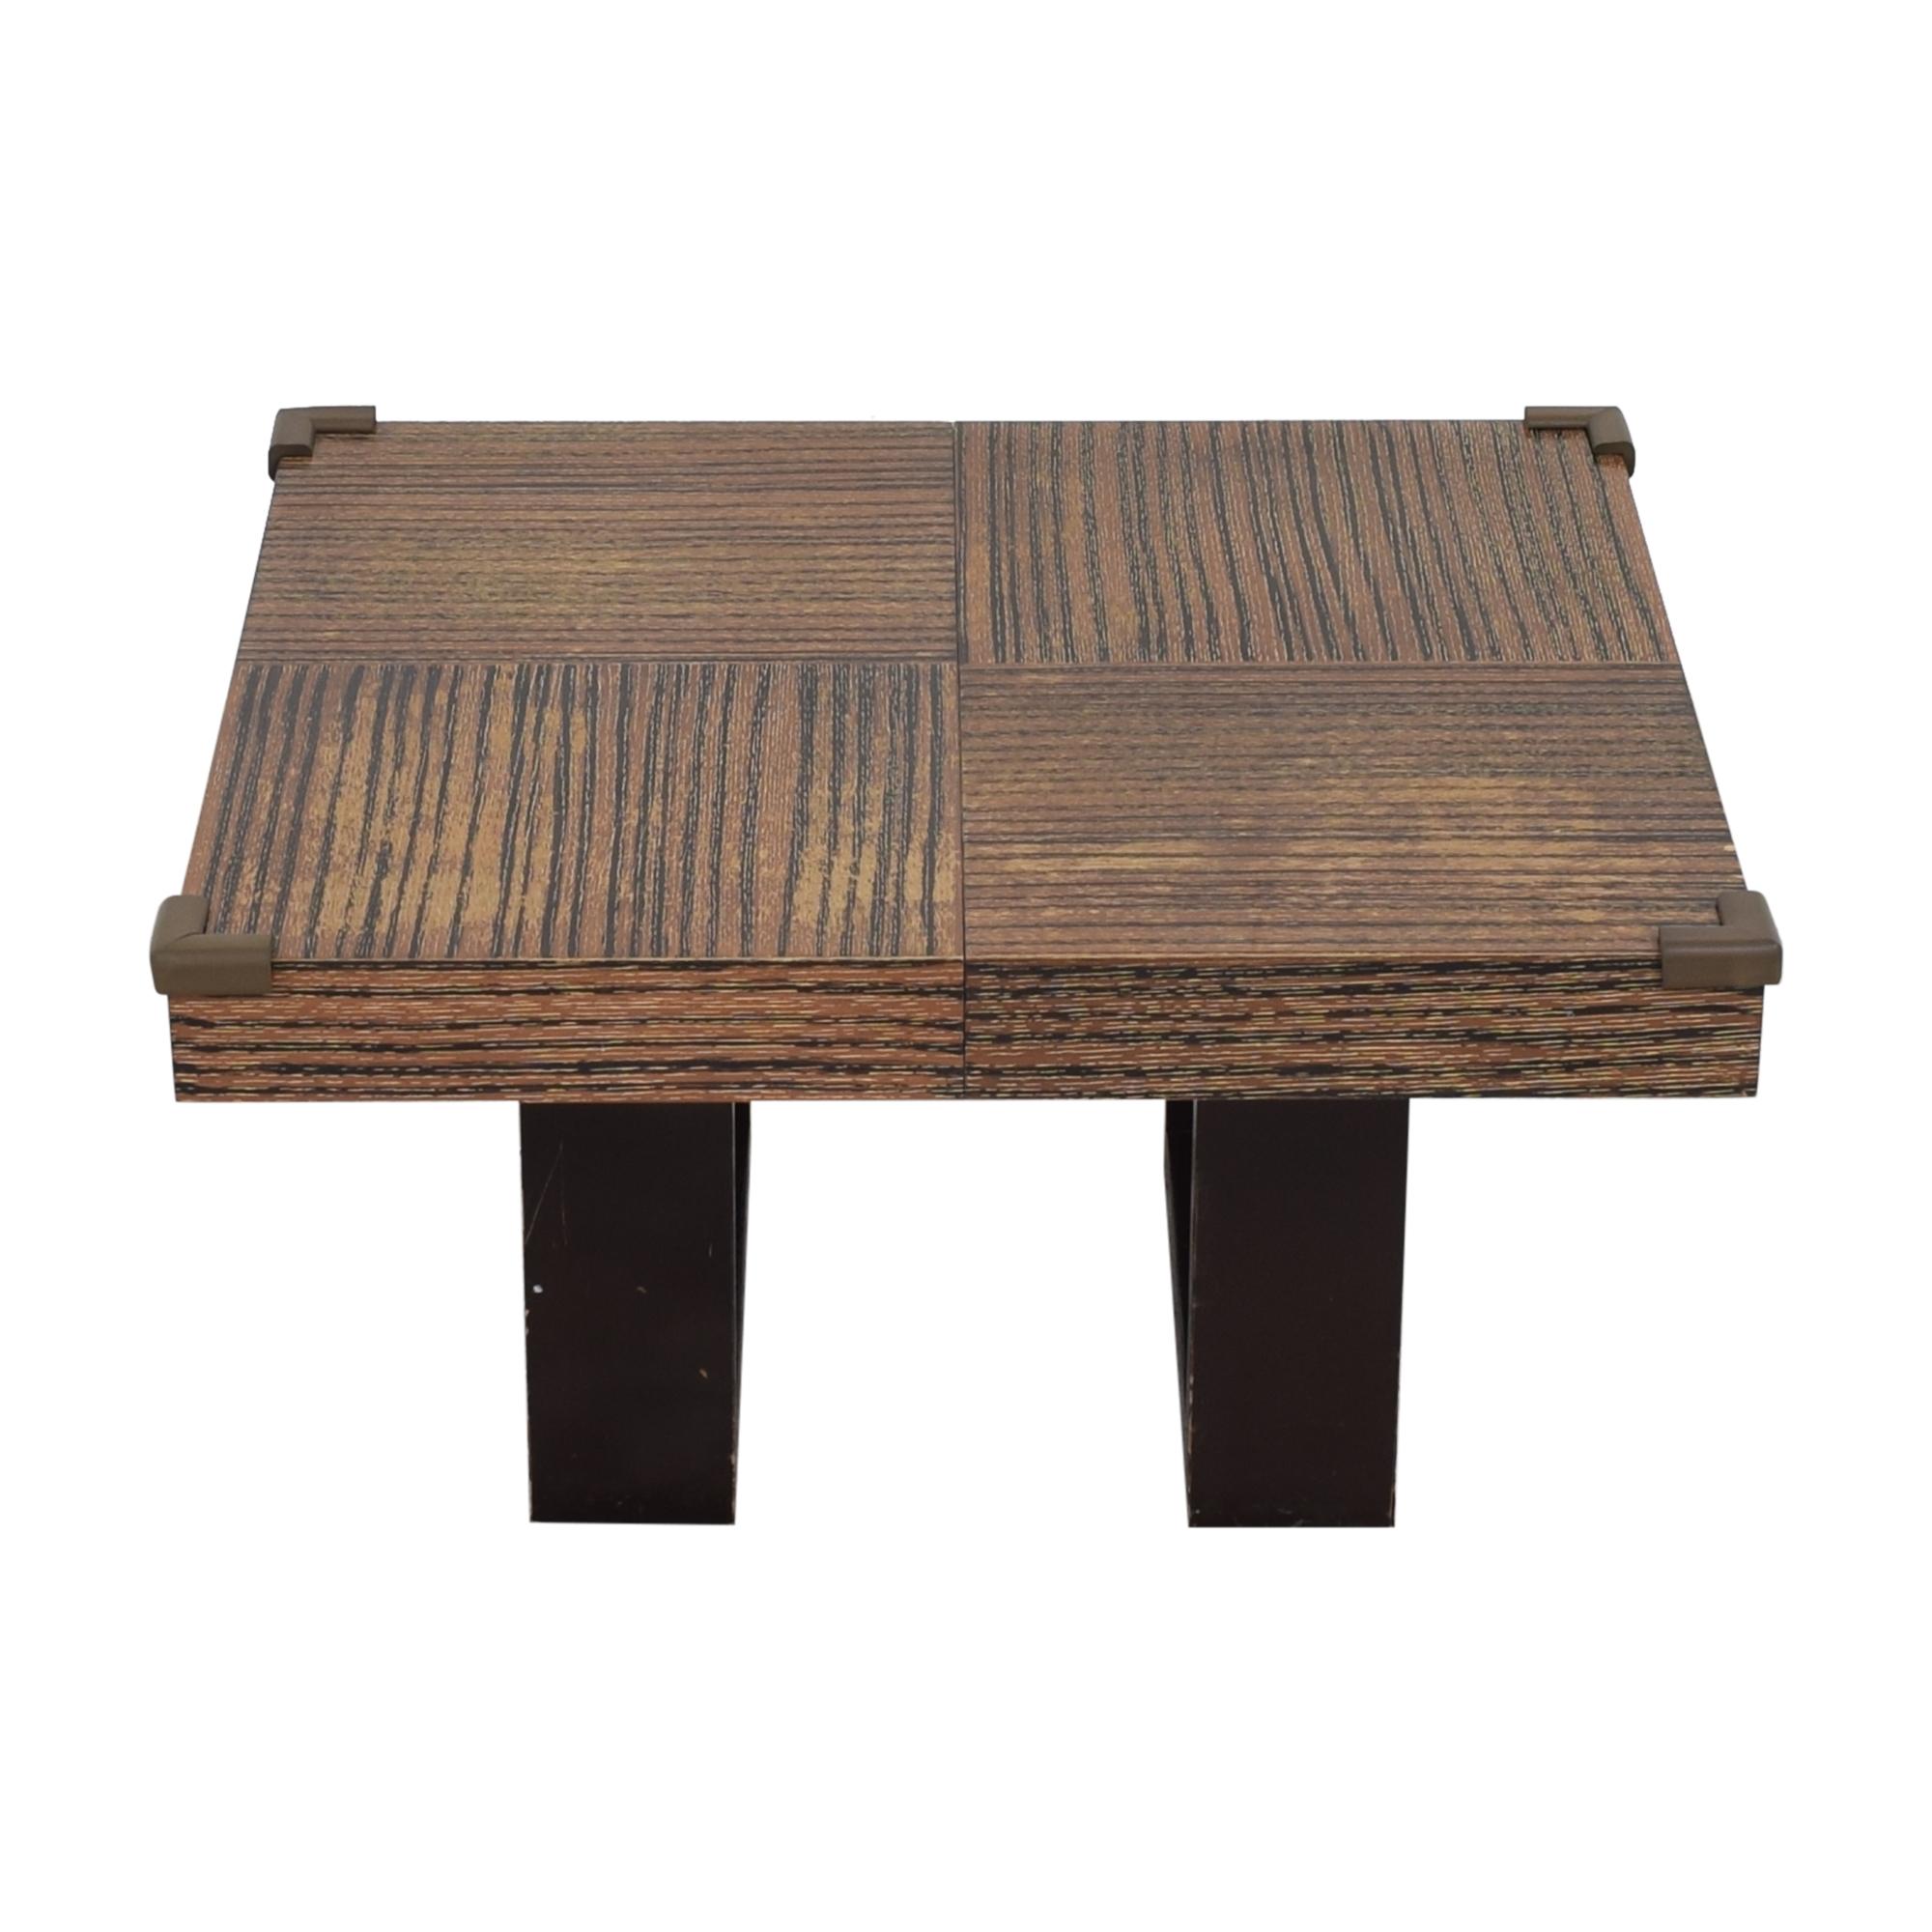 buy Michael Berman Limited Trousdale Coffee Table Michael Berman Limited Tables